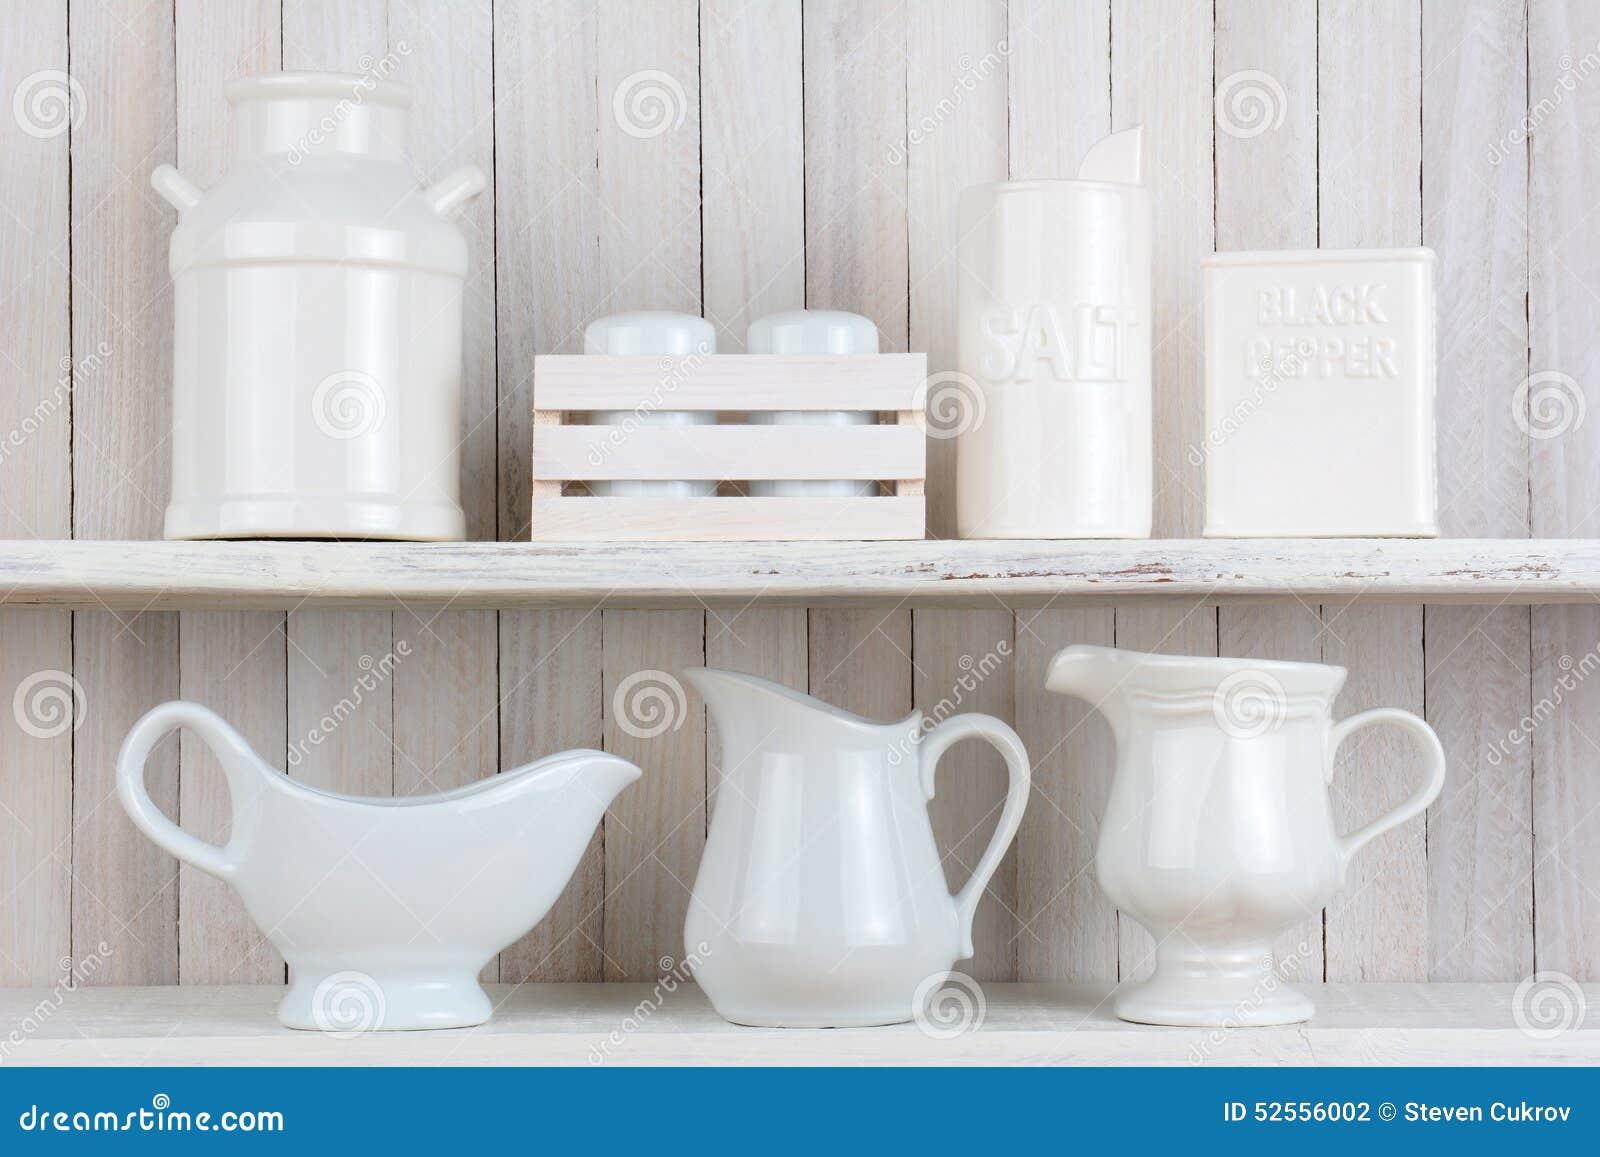 White Rustic Kitchen Shelves Stock Photo - Image of pepper, salt ...